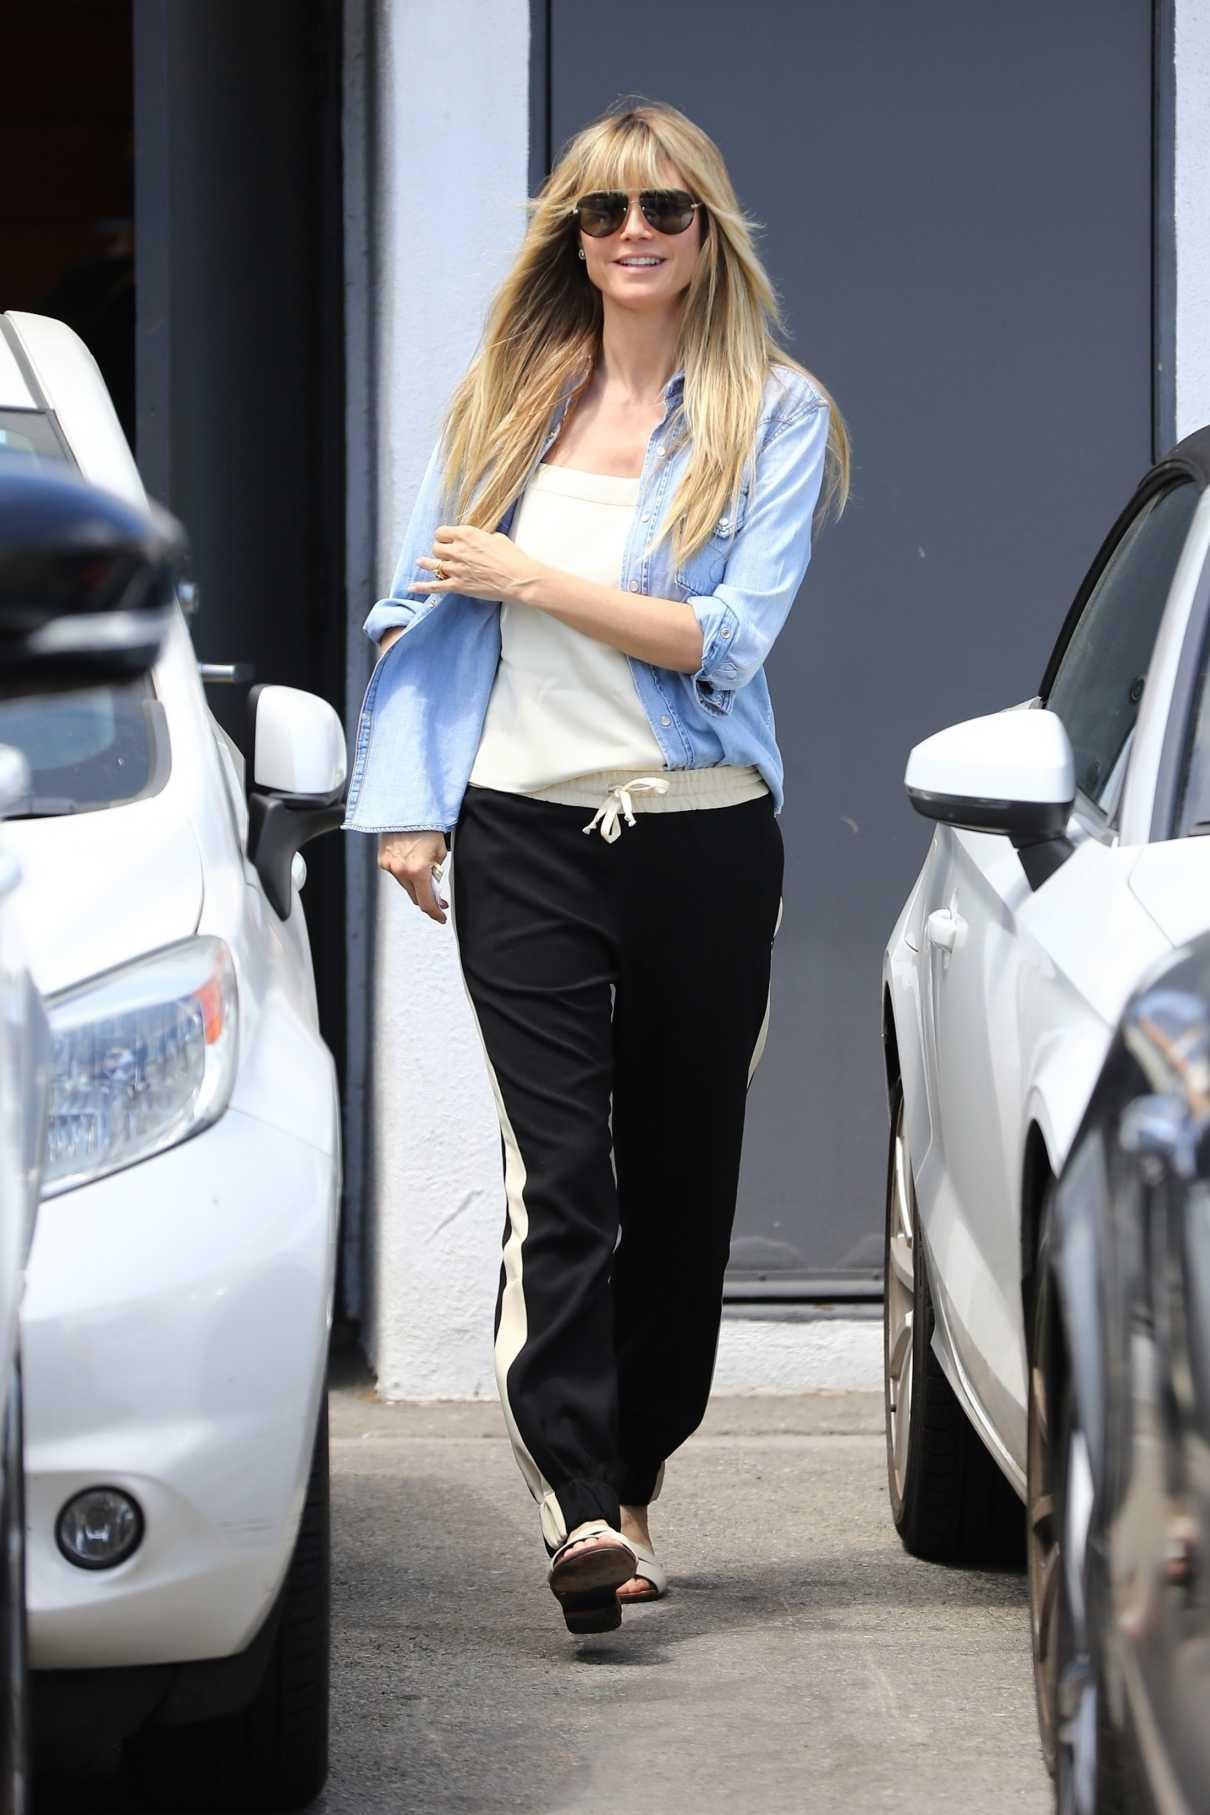 Heidi Klum in a Blue Denin Shirt